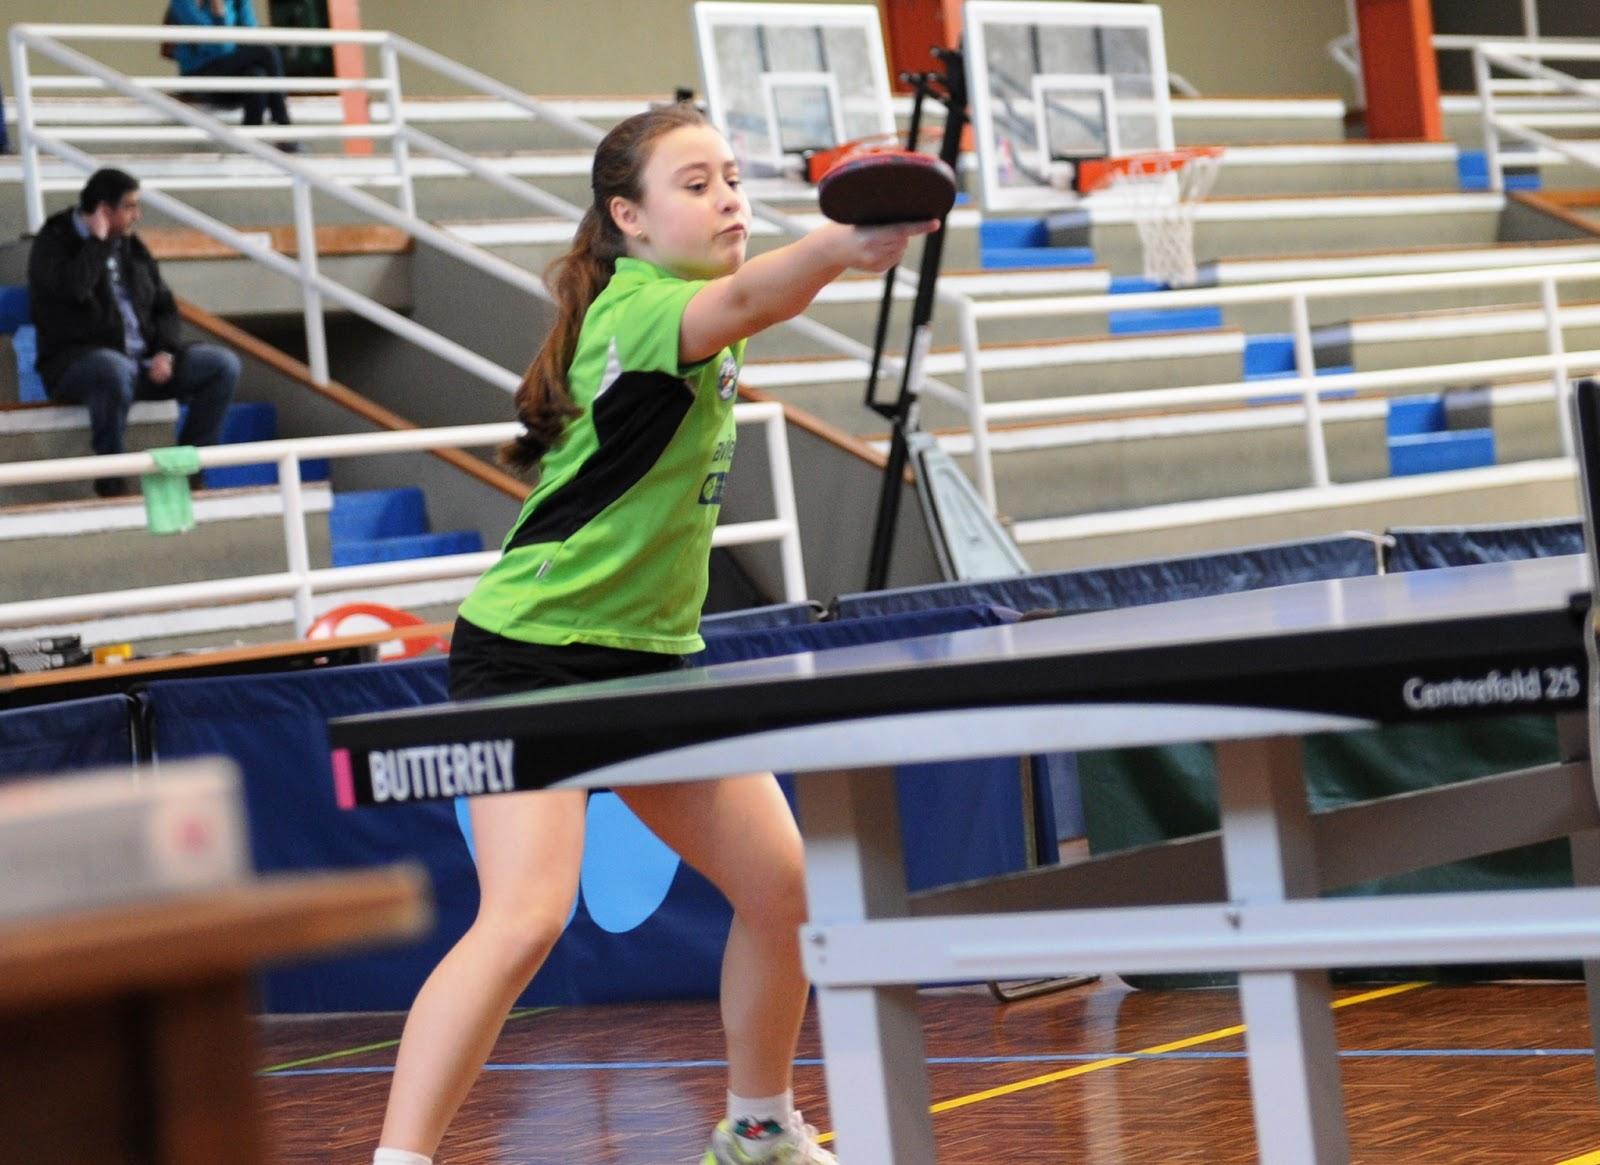 Avil s tenis de mesa resultados de la liga nacional - Aviles tenis de mesa ...